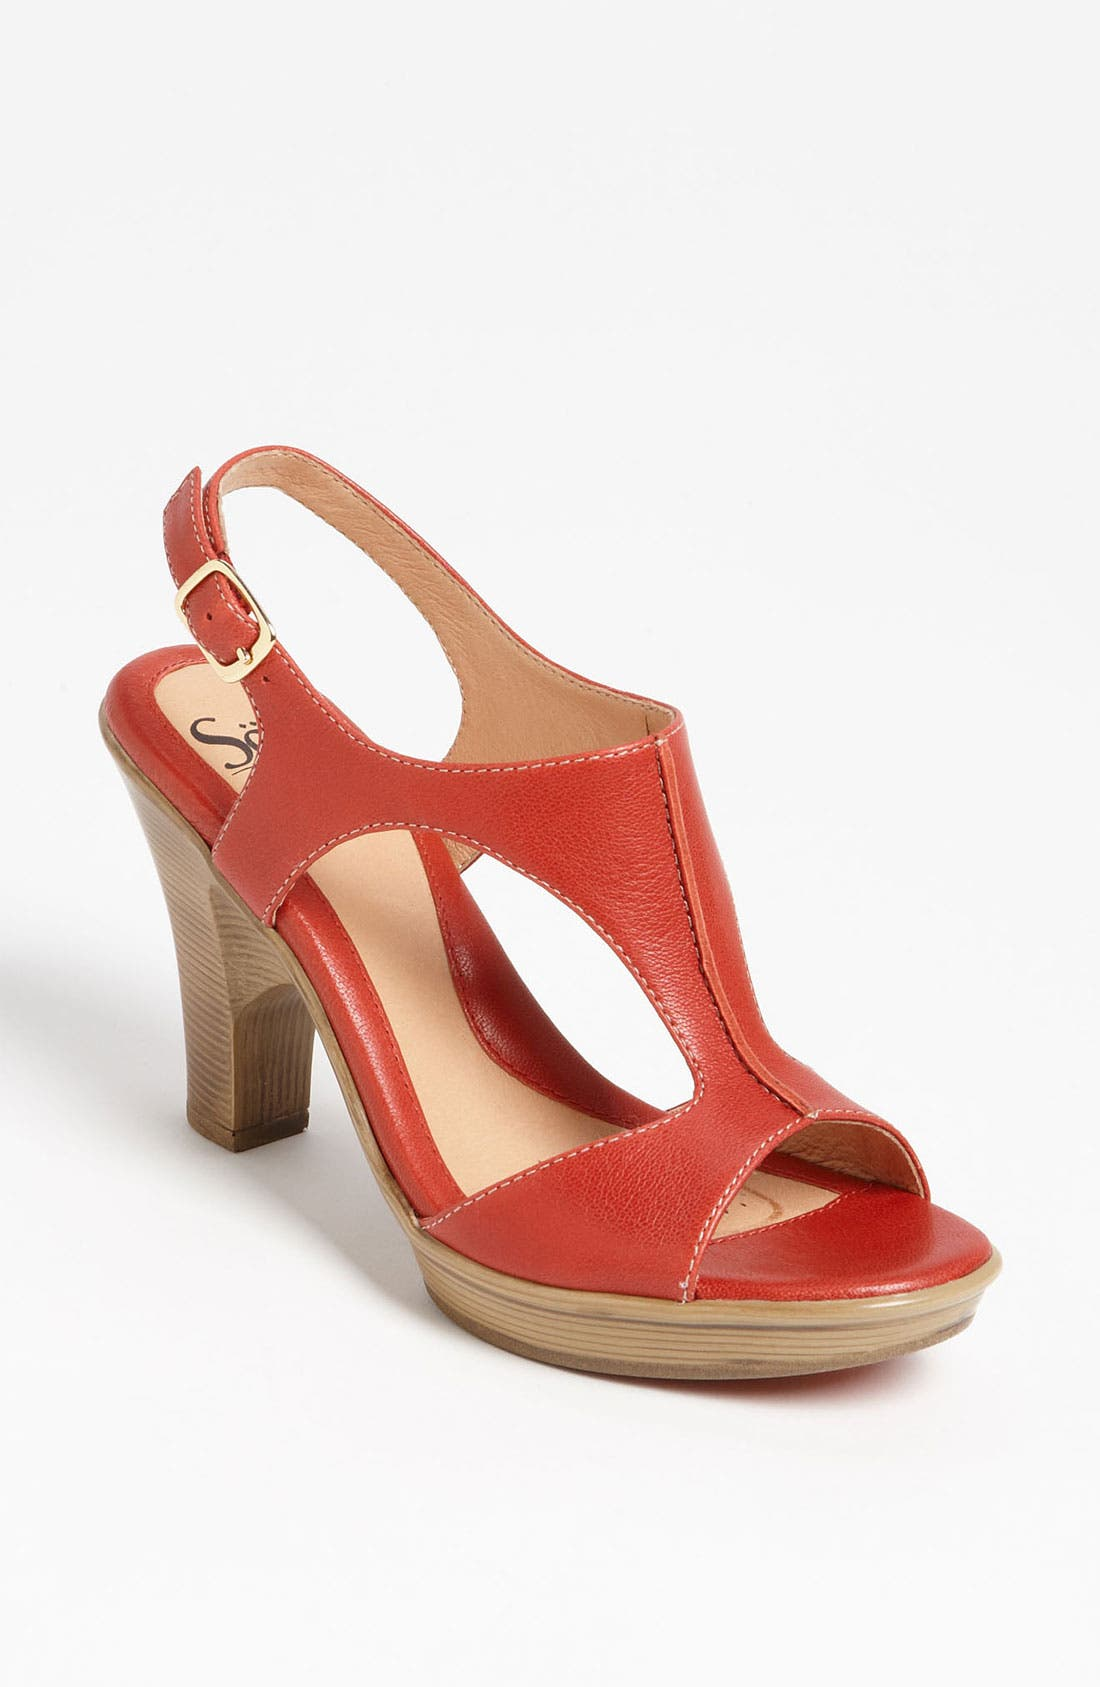 Alternate Image 1 Selected - Söfft 'Vannie' Sandal